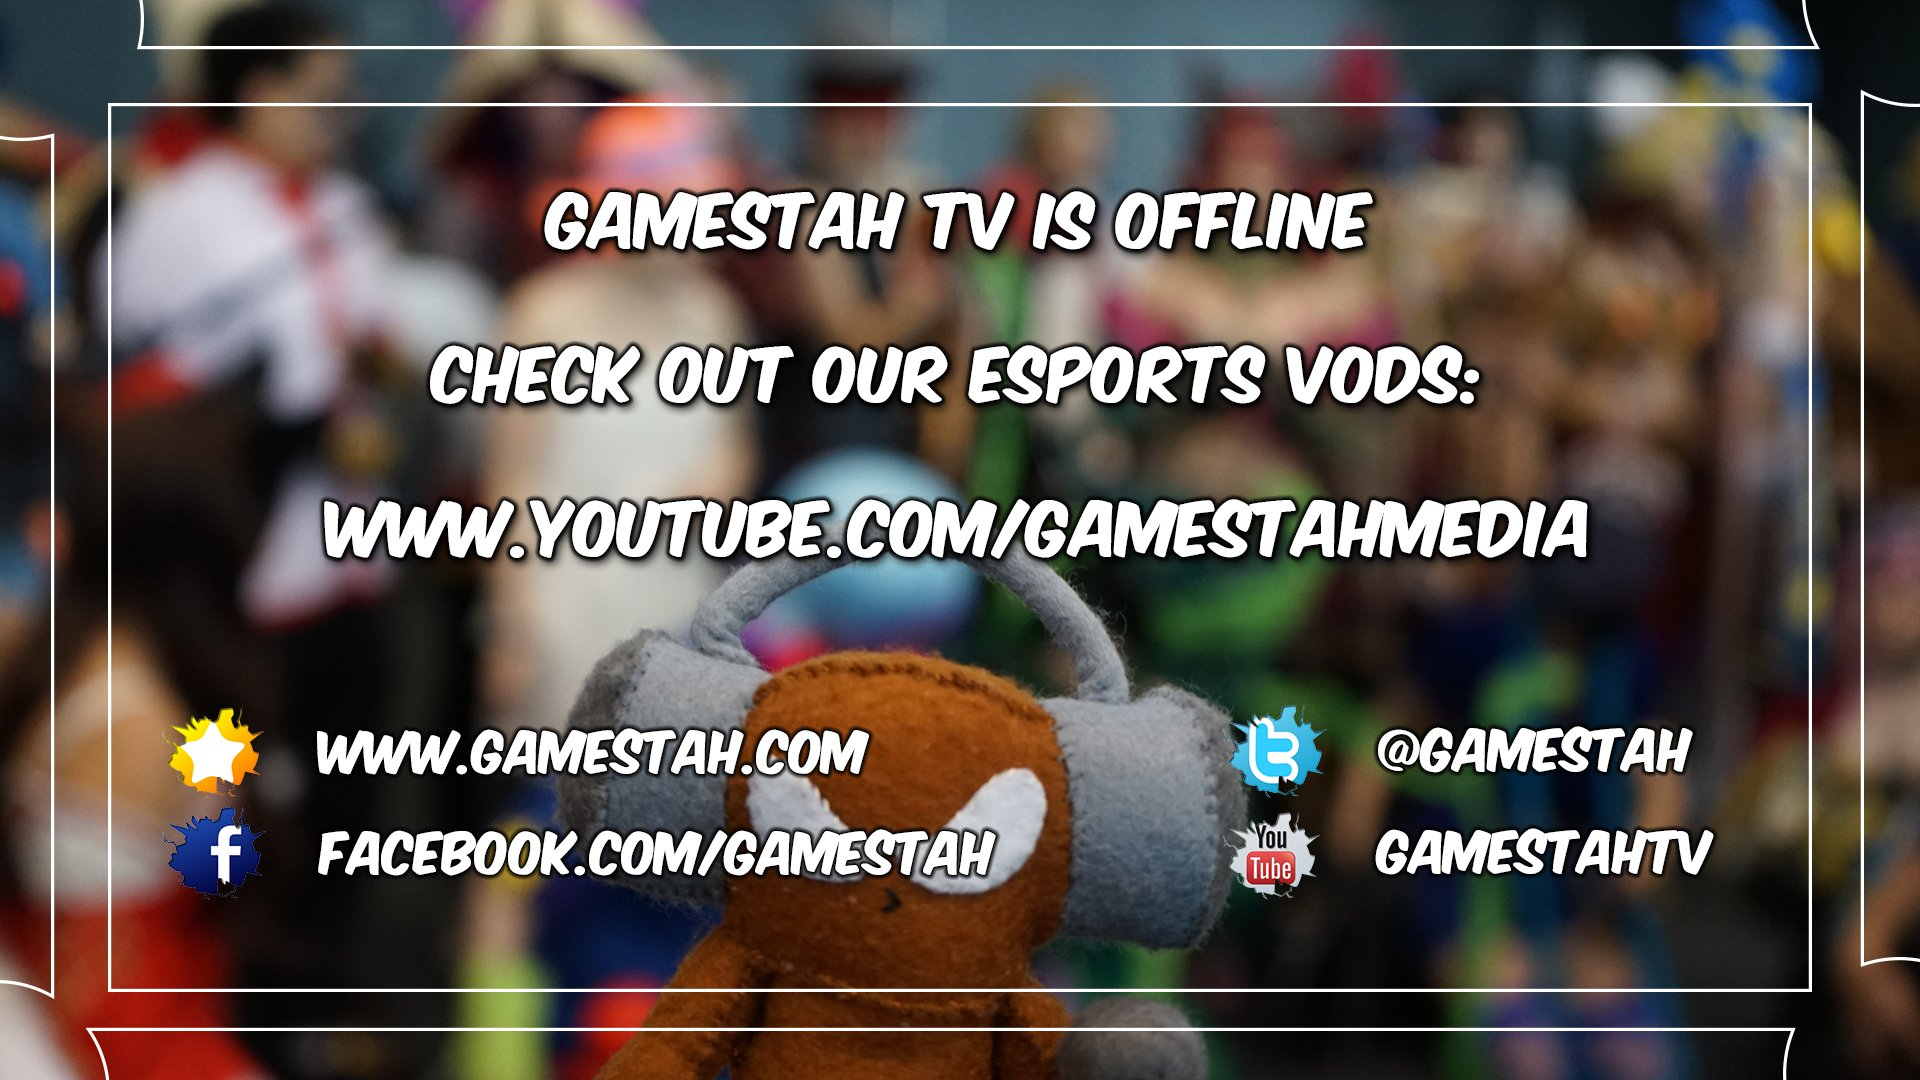 gamestahtv1 channel offline image b6a2f6c a6e